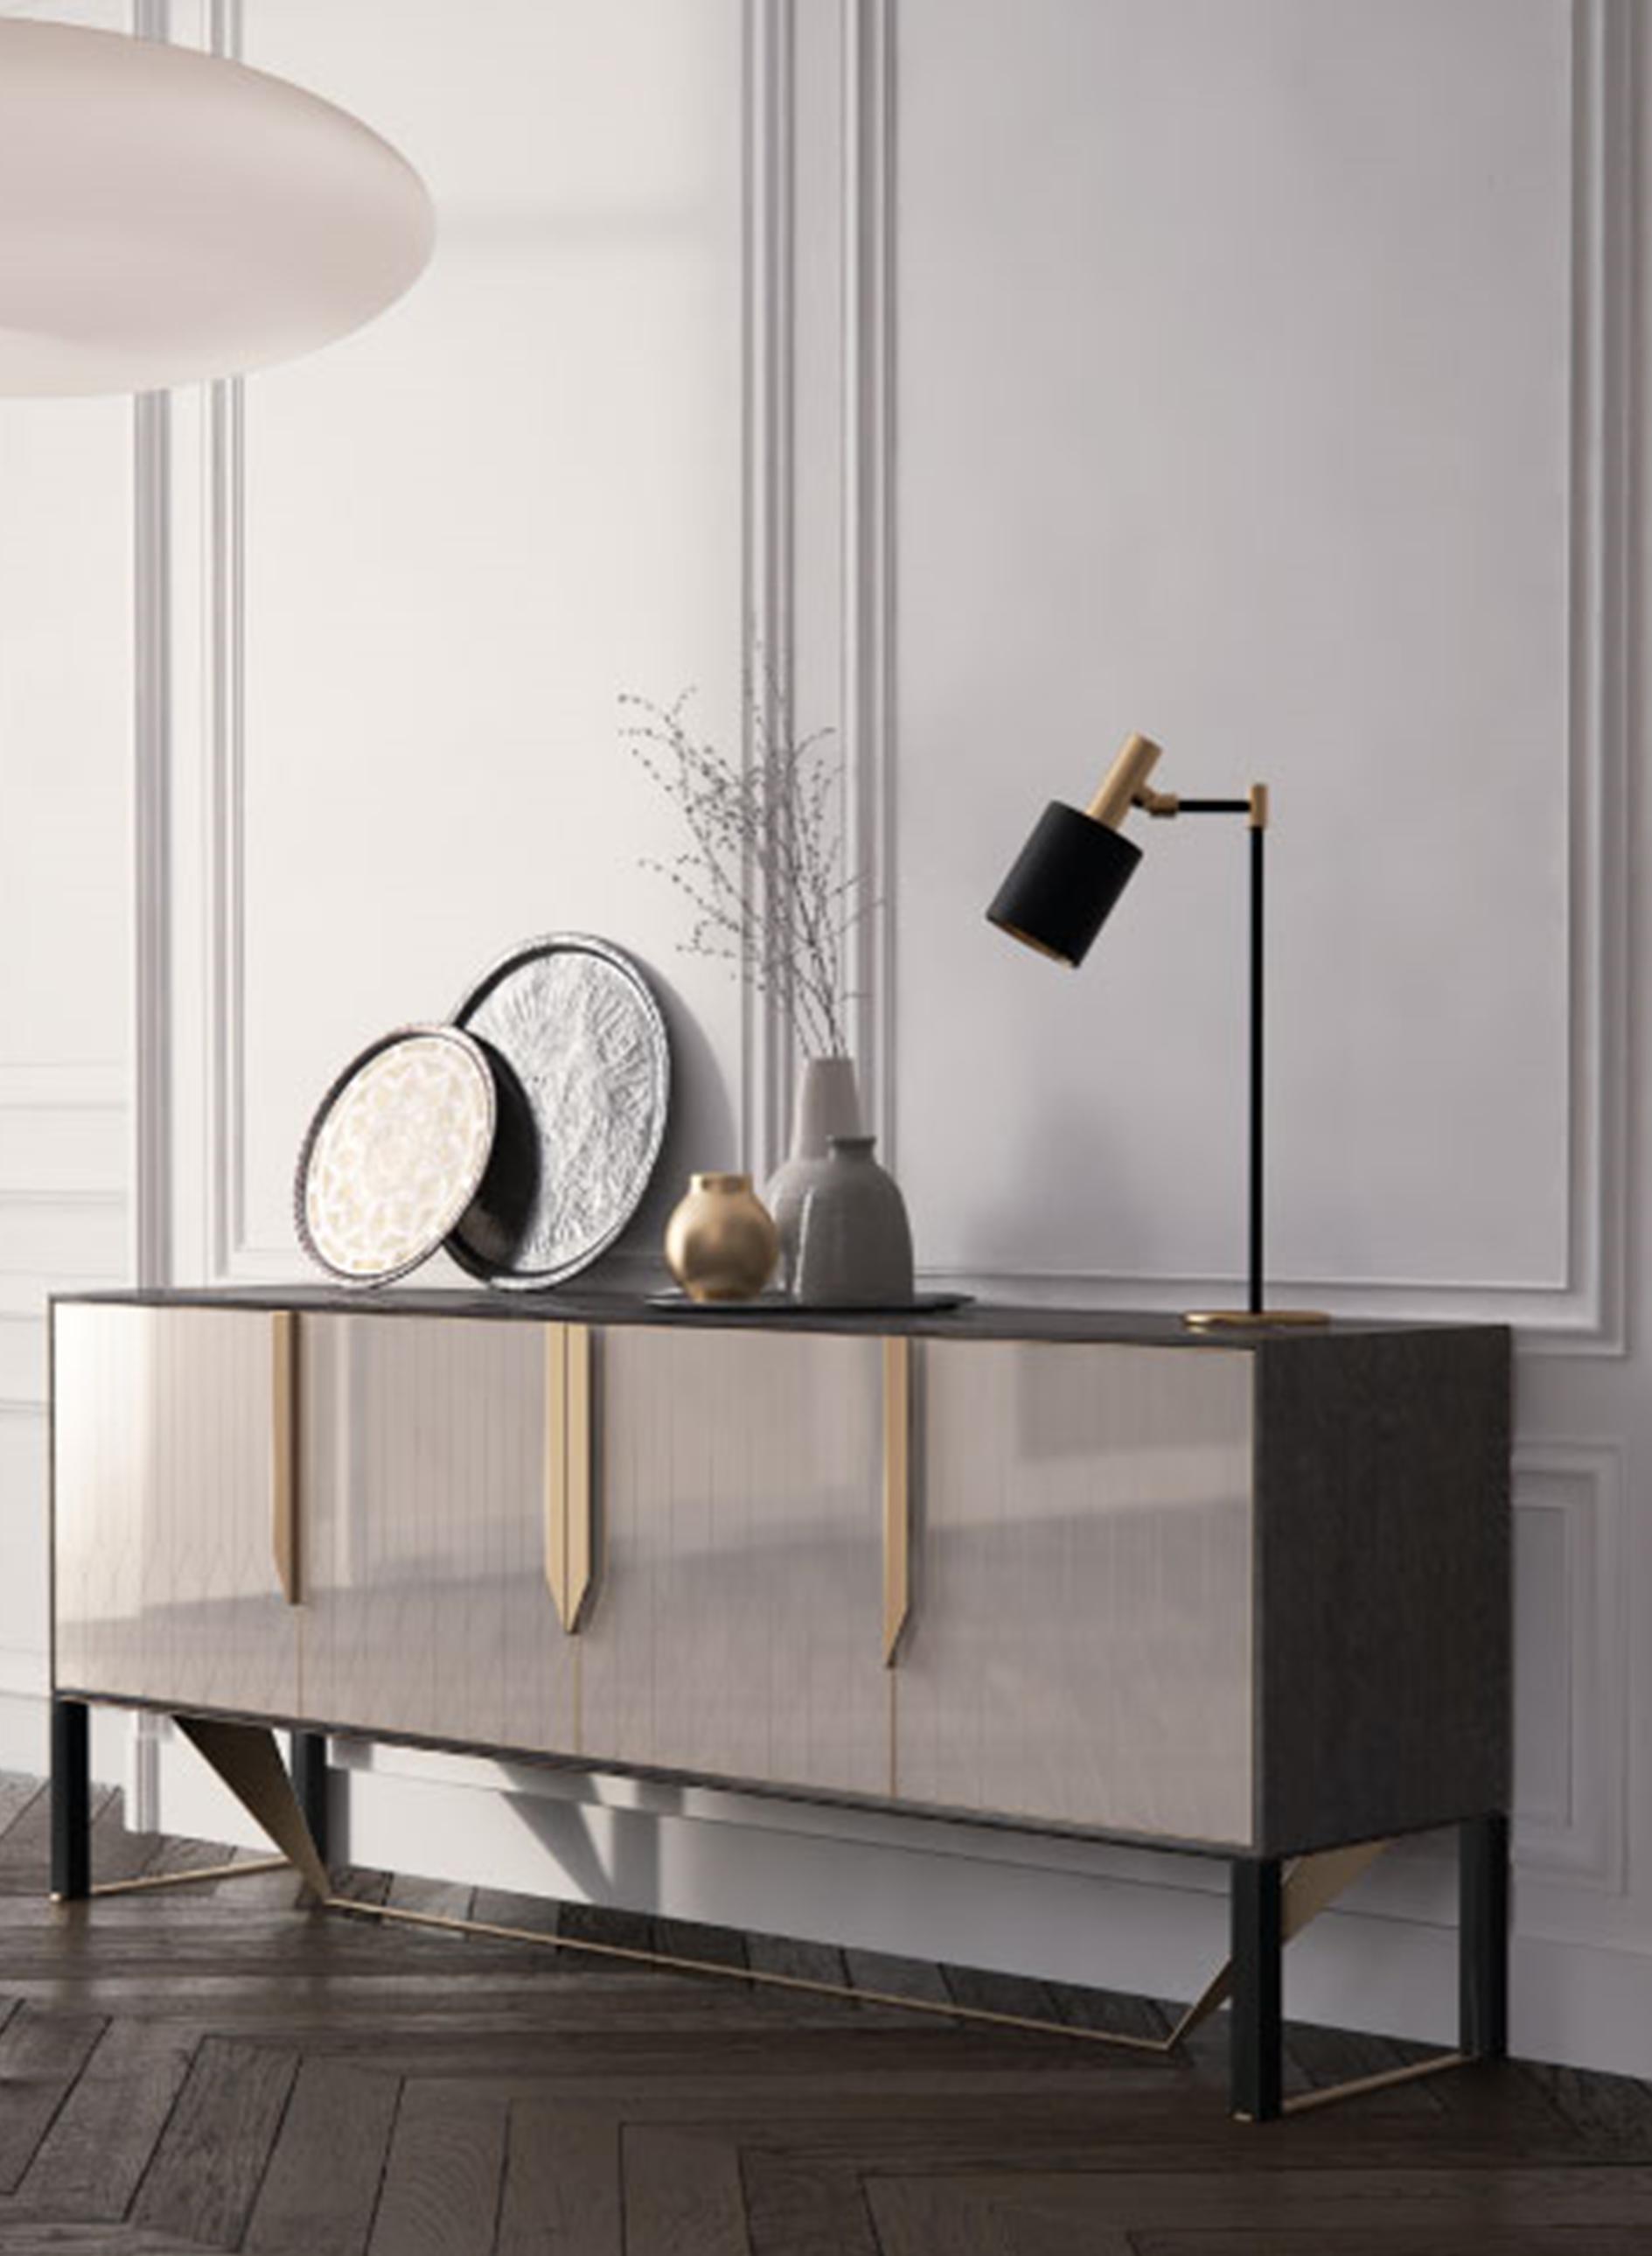 Luxury Sideboard Ideas In 2021 Sideboard Furniture Luxury Sideboard Interior Furniture